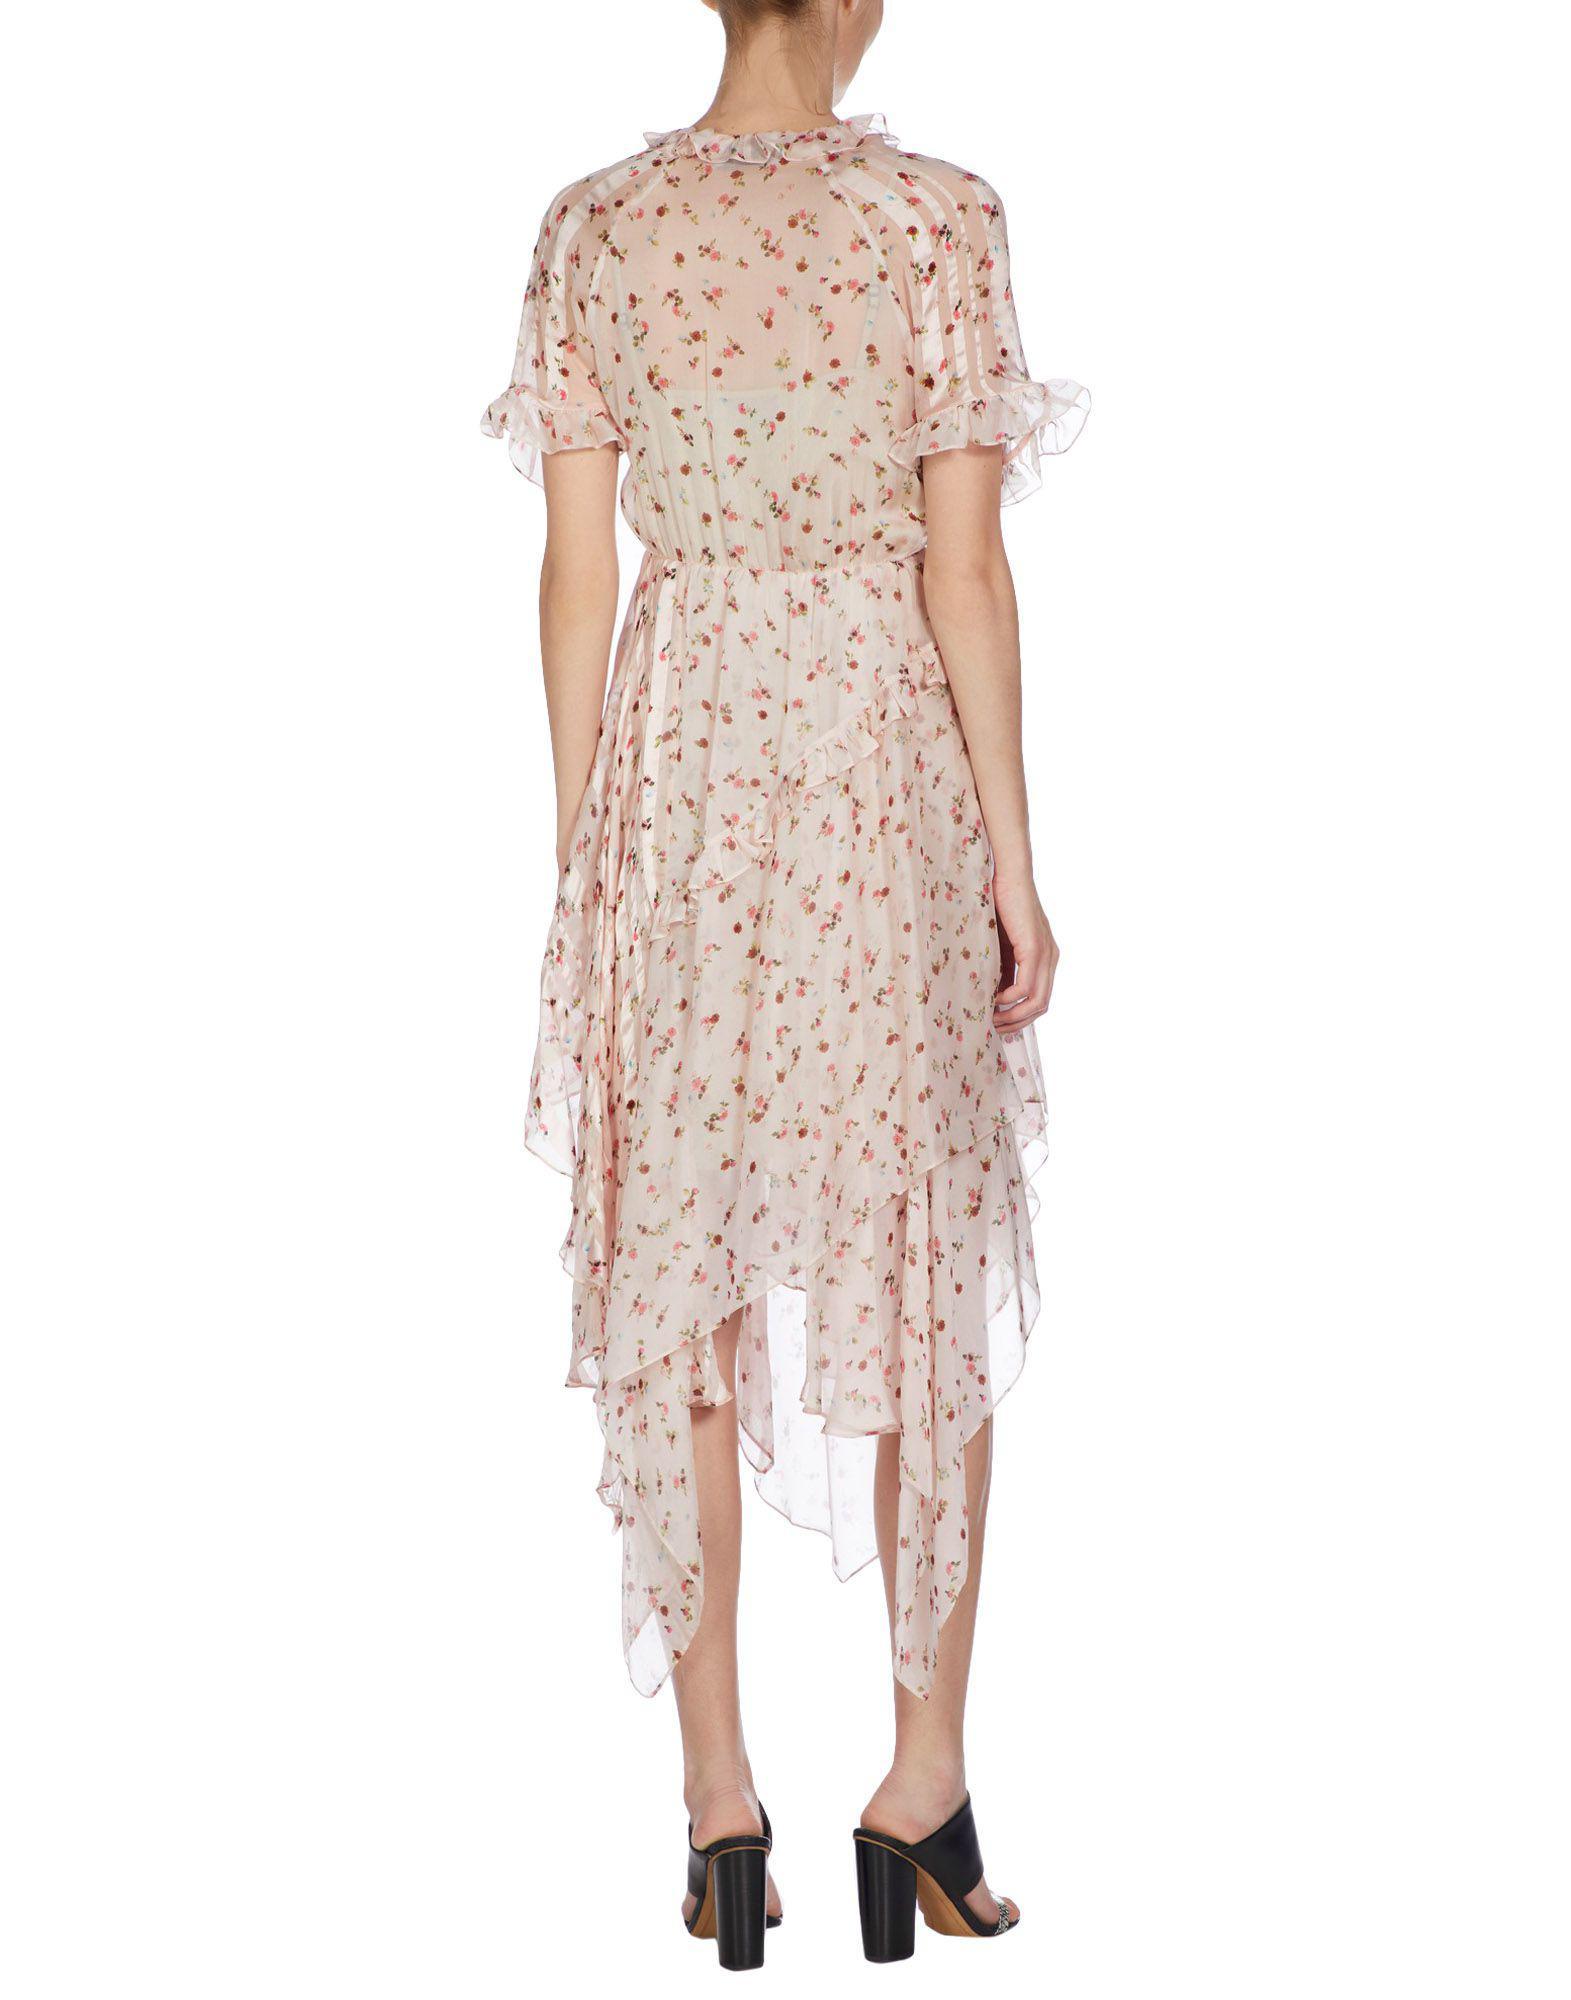 By Lyst Bregazzi Pink Thornton Length Preen Dress 34 In 7qwqBfpS